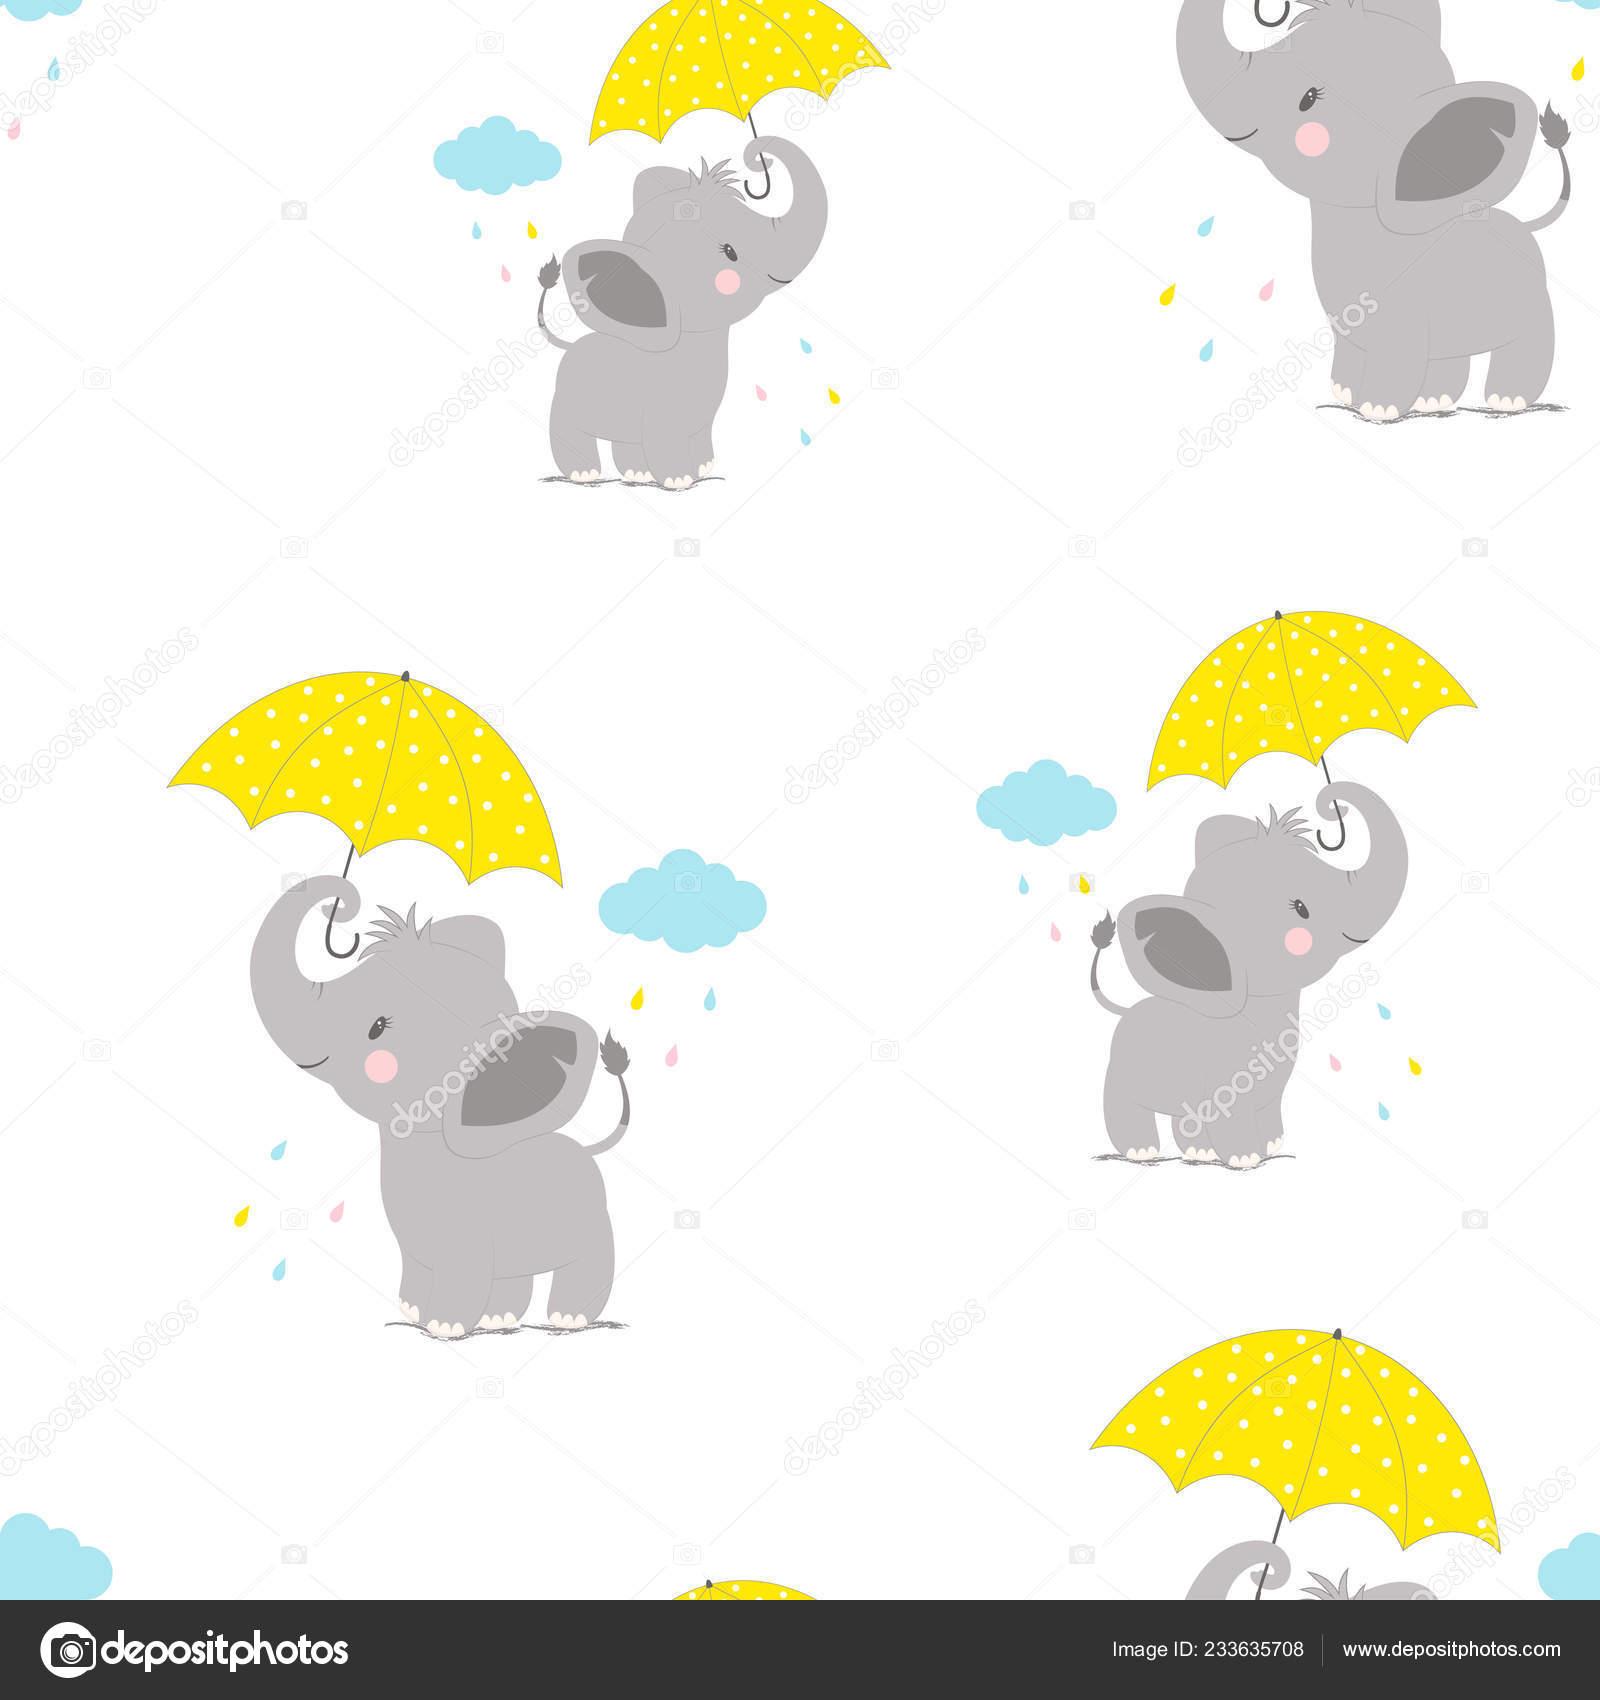 Cartoon Style Pattern Funny Elephant Umbrella Backgroung Cloud